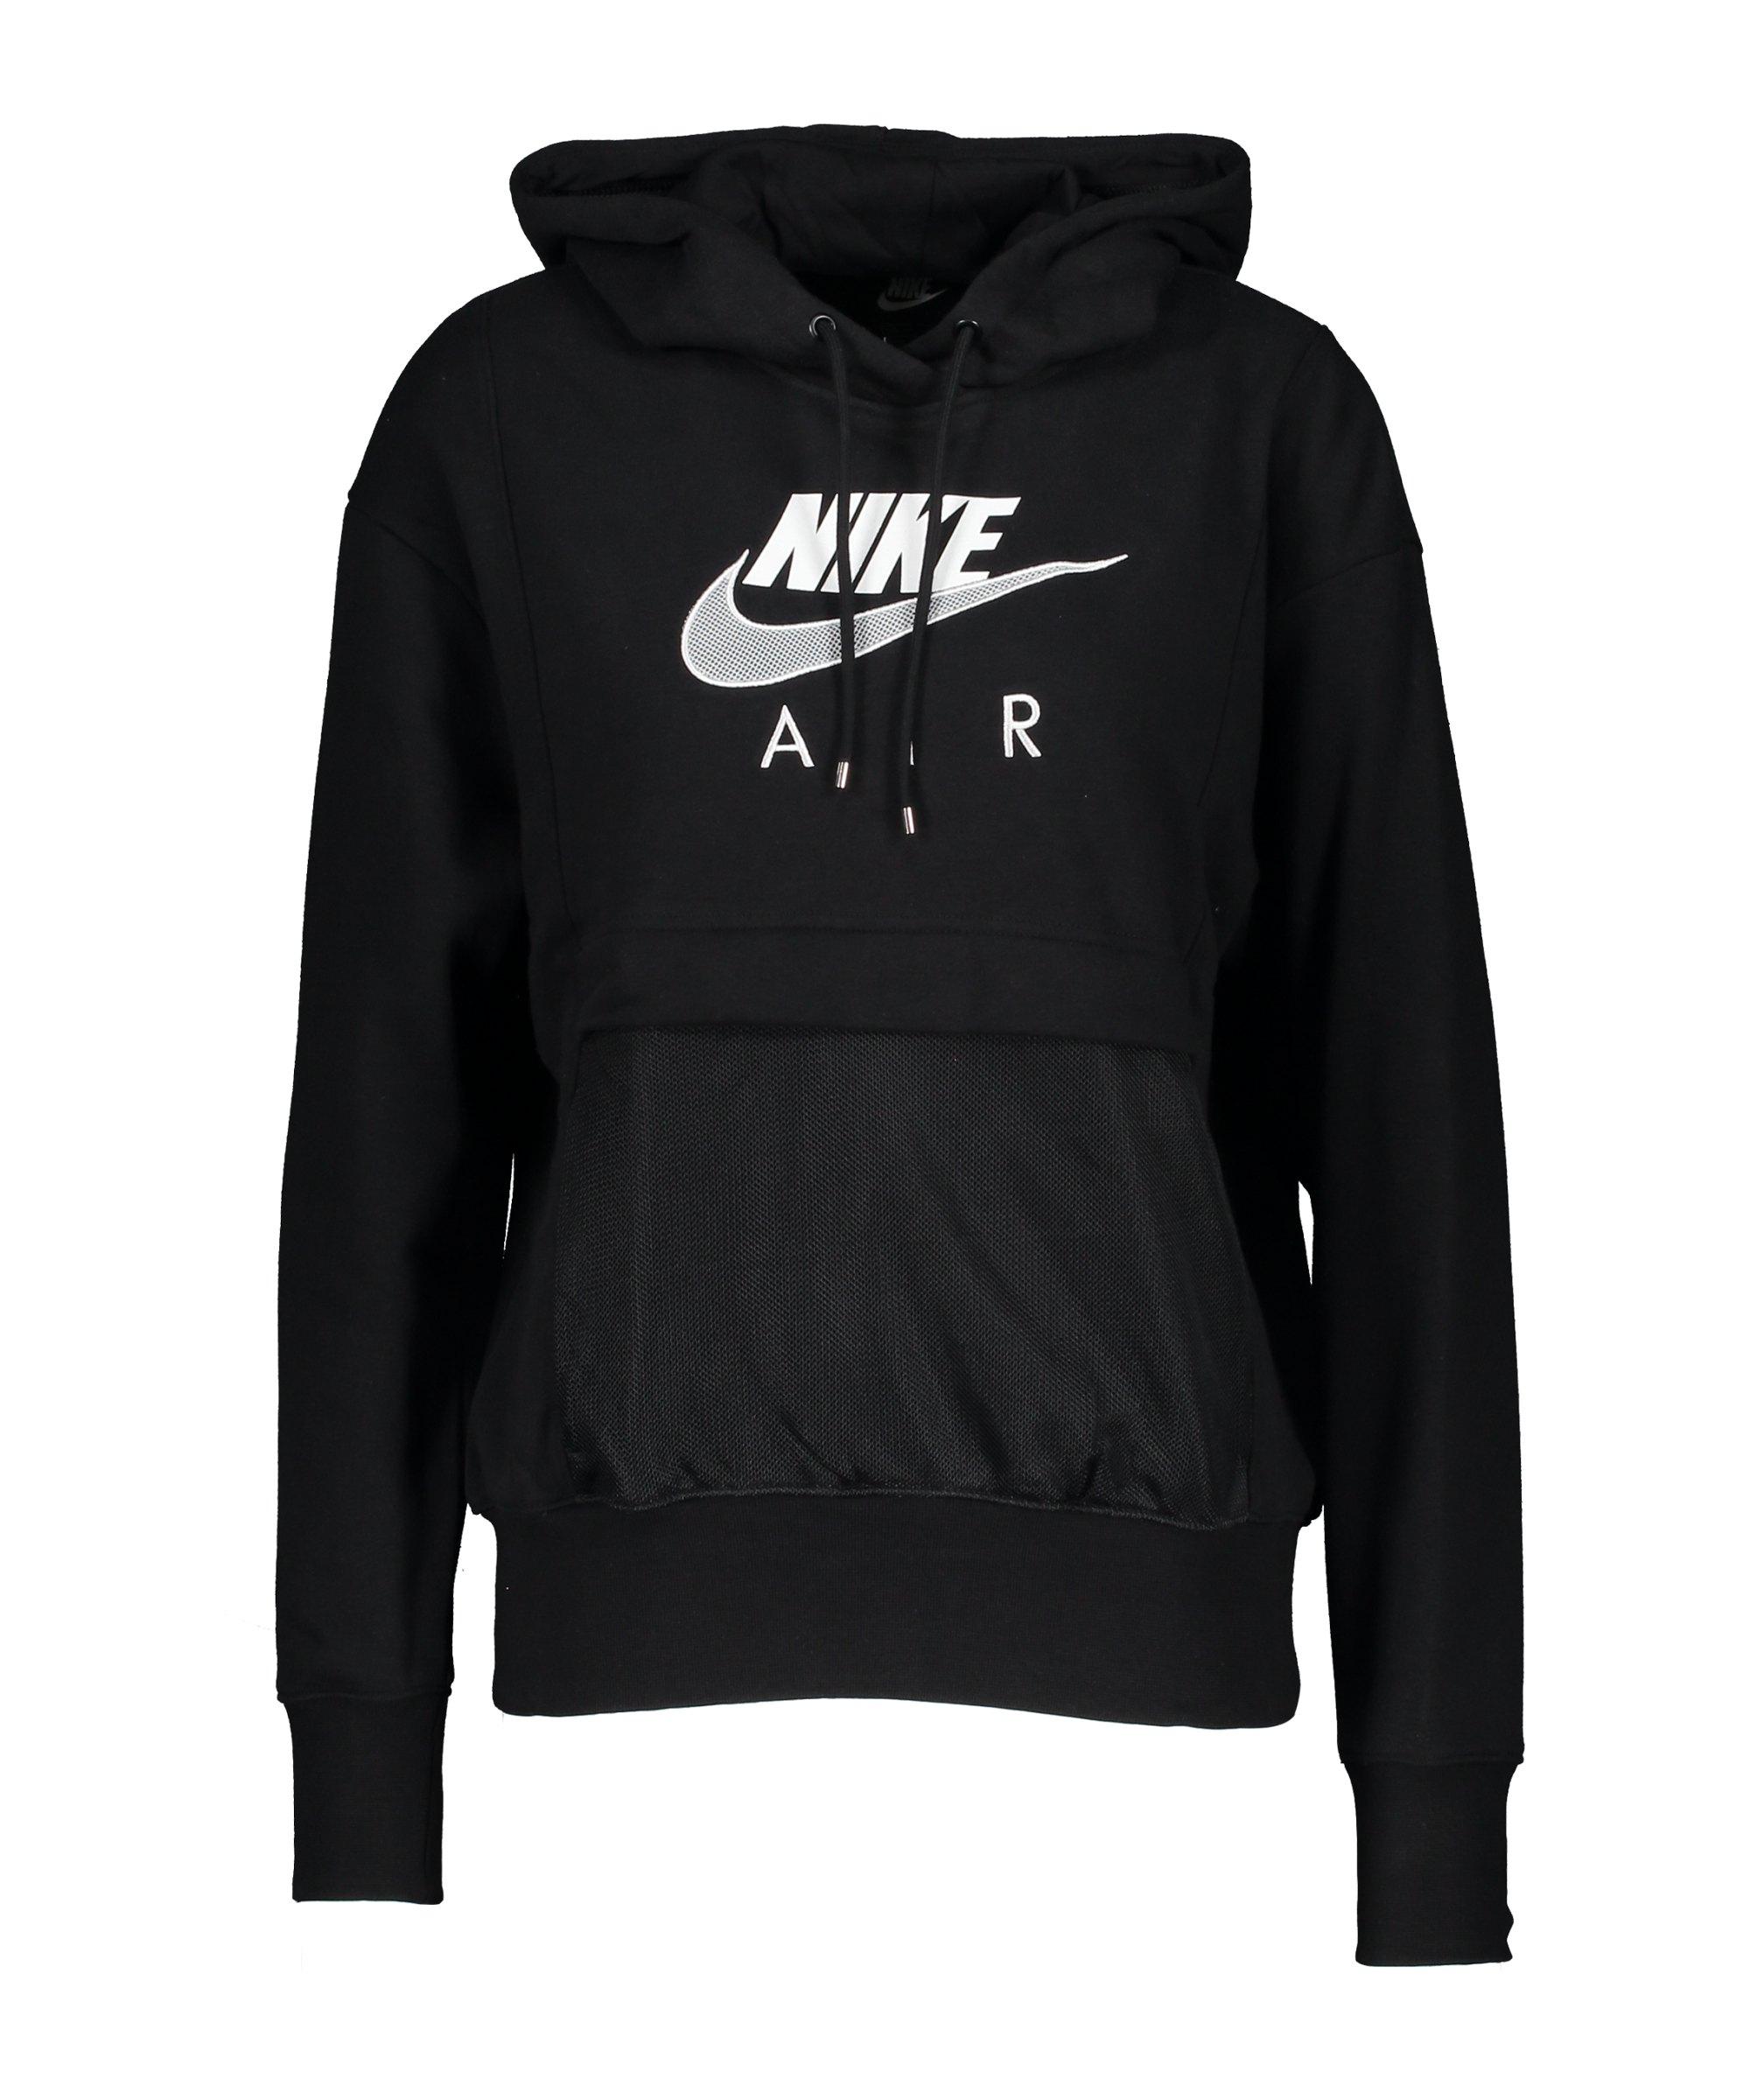 Nike Air Fleece Hoody Damen Schwarz Weiss F010 - schwarz